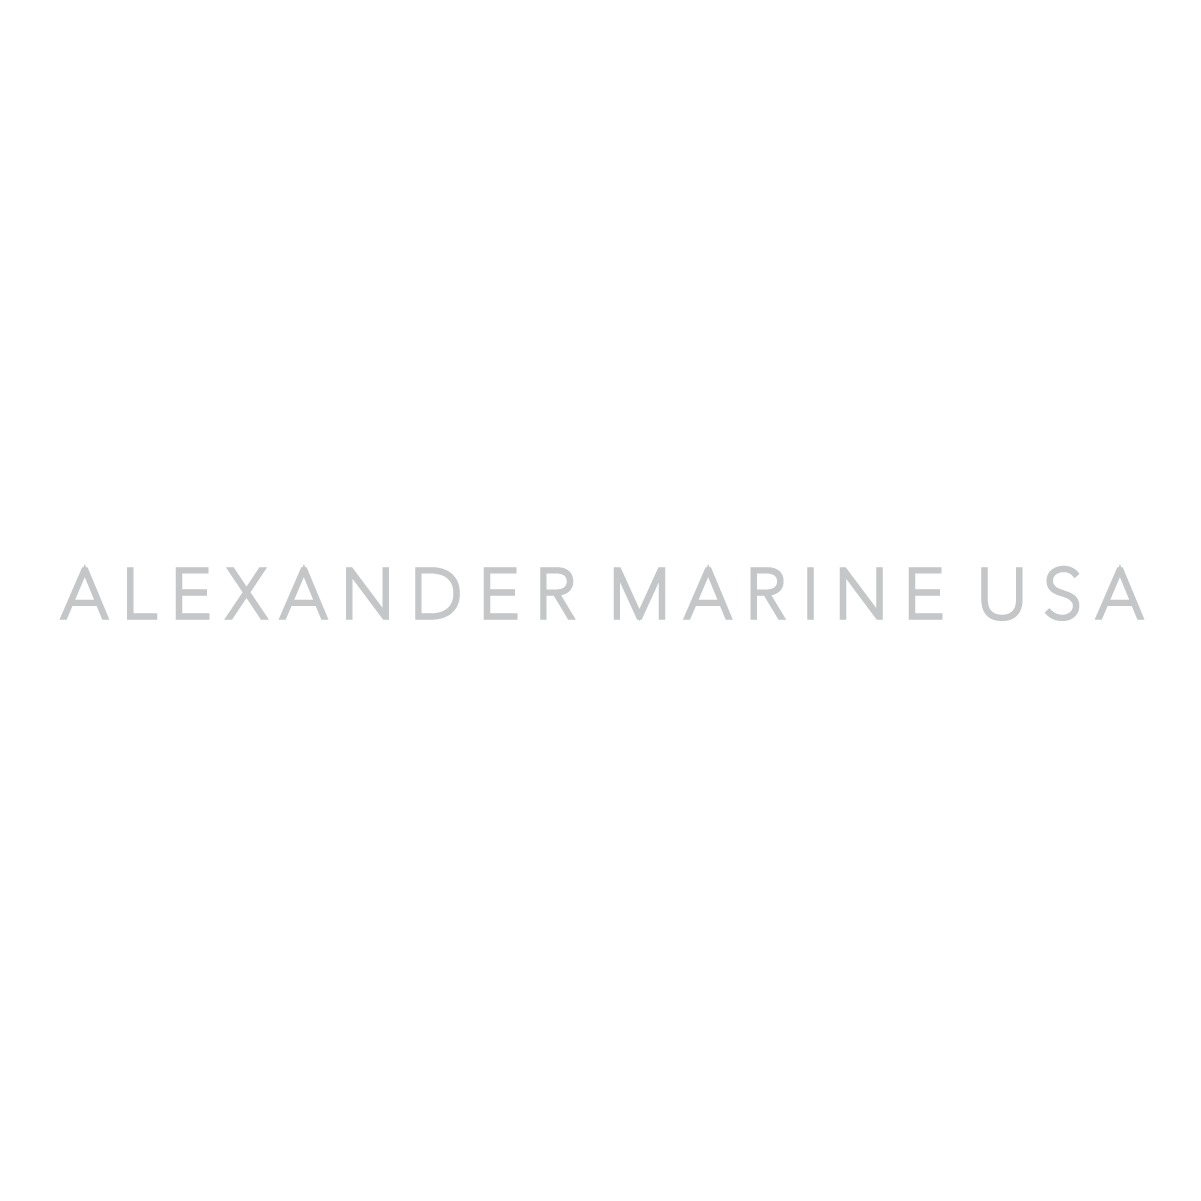 Alexander Marine USA.png